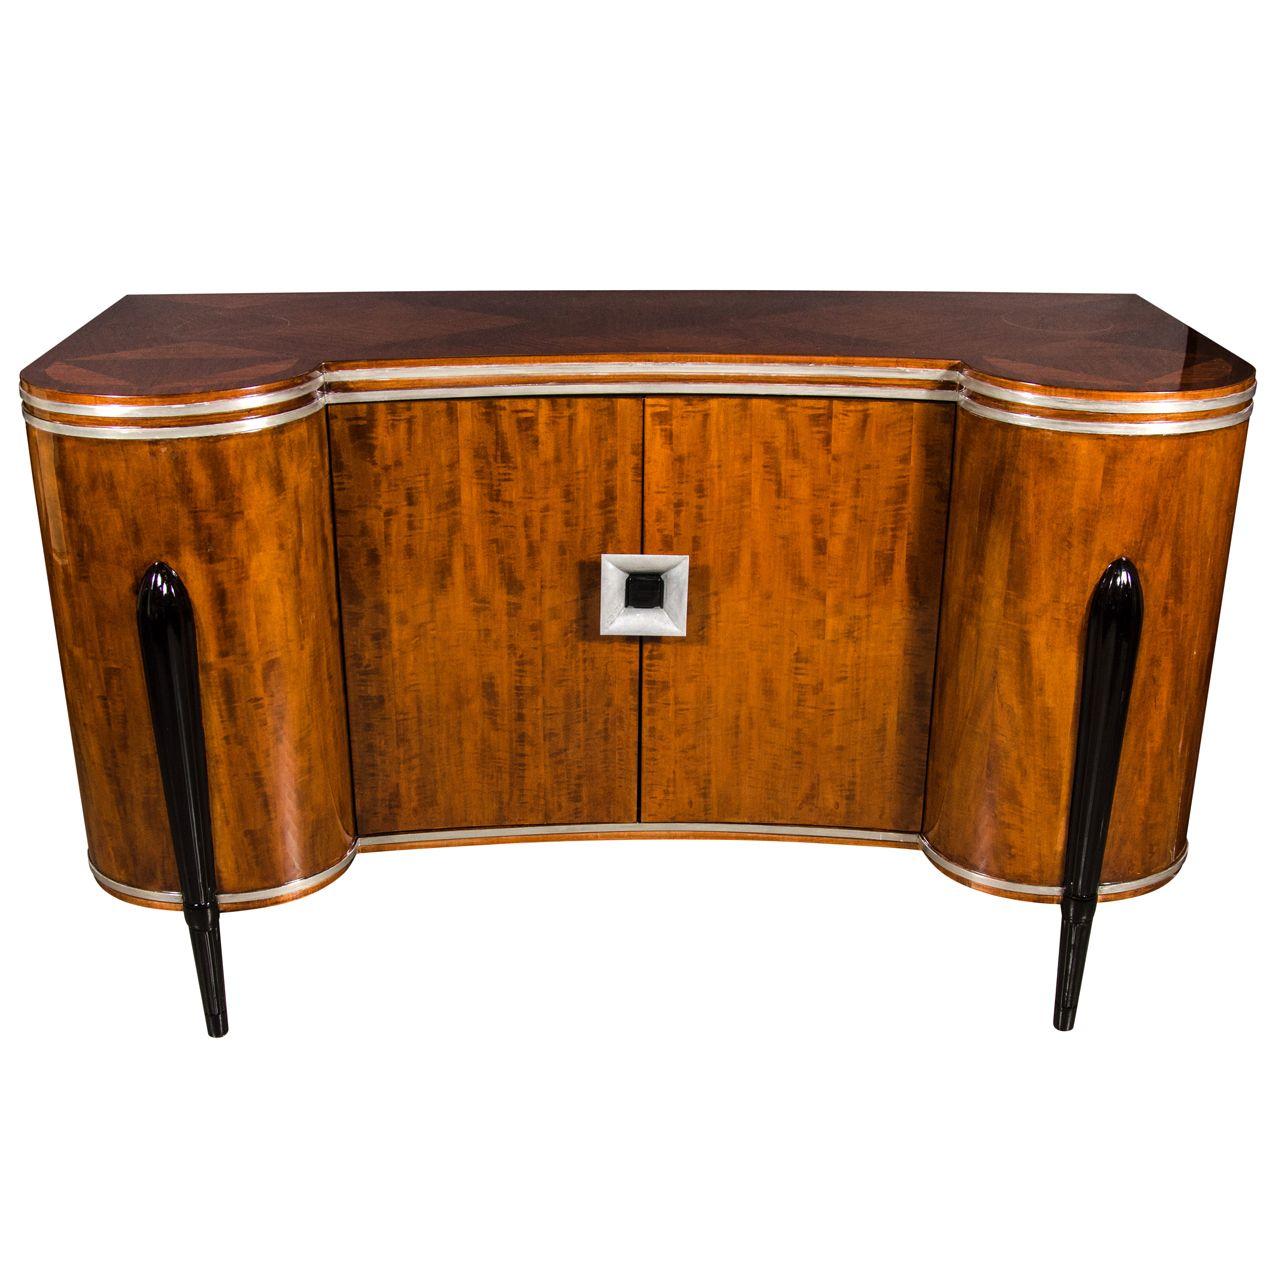 Art Deco Buffet Cabinet In The Manner Of Ruhlmann Art Deco